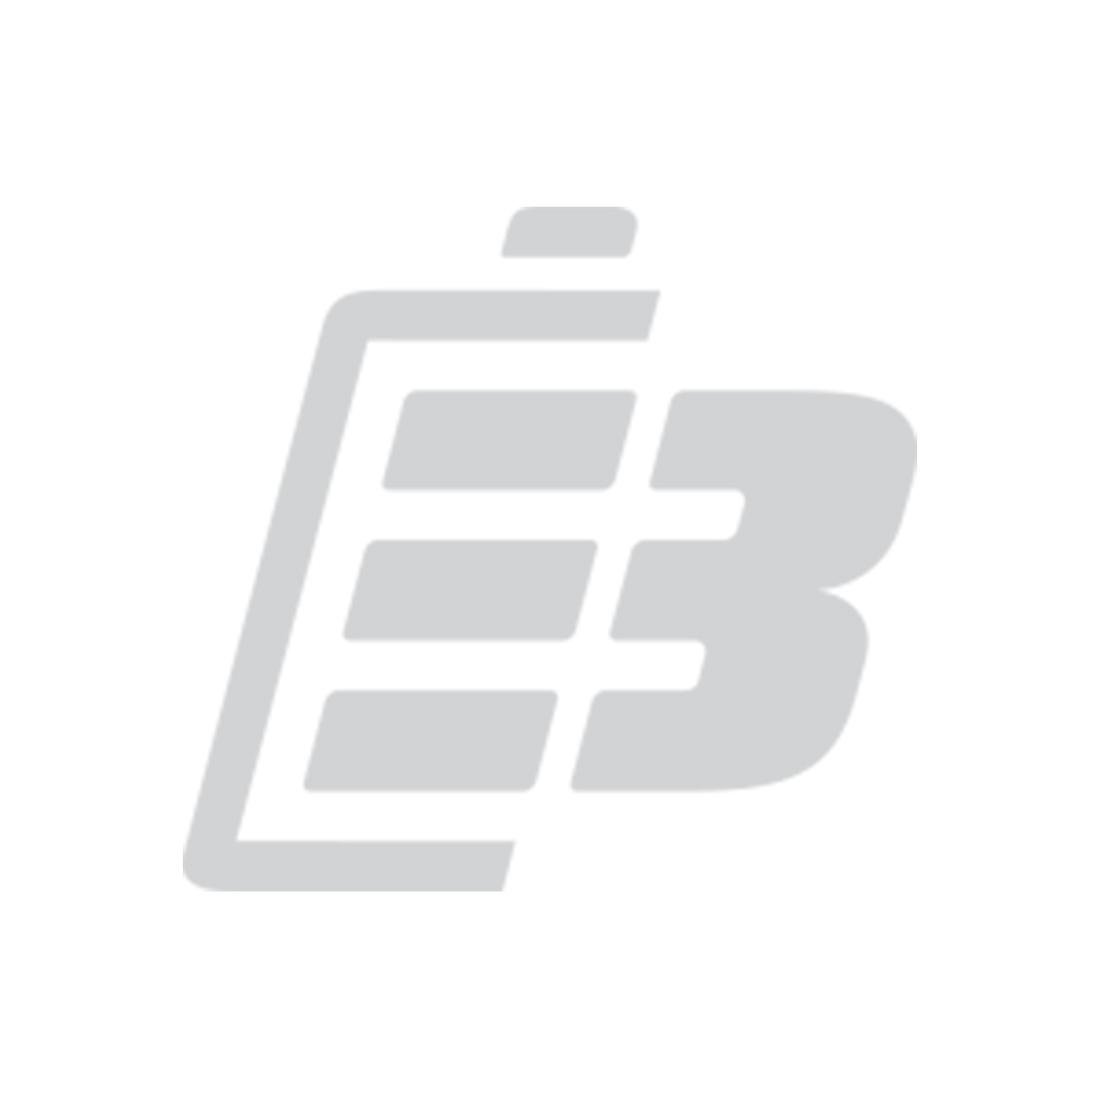 Fenix TK20R LED flashlight 1